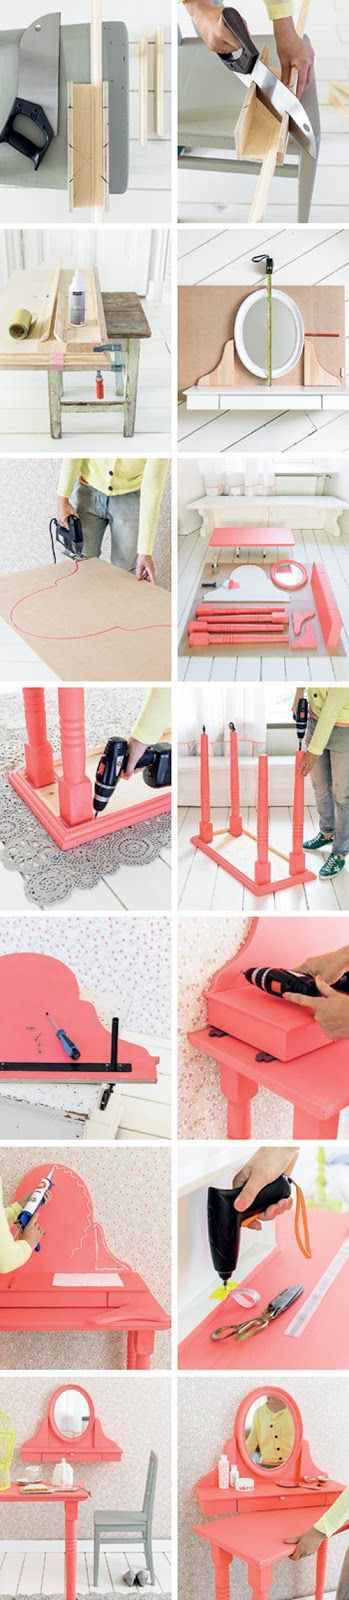 Heart Handmade UK: Dressing Table on Wheels DIY From 101 Woonideeen Magazine